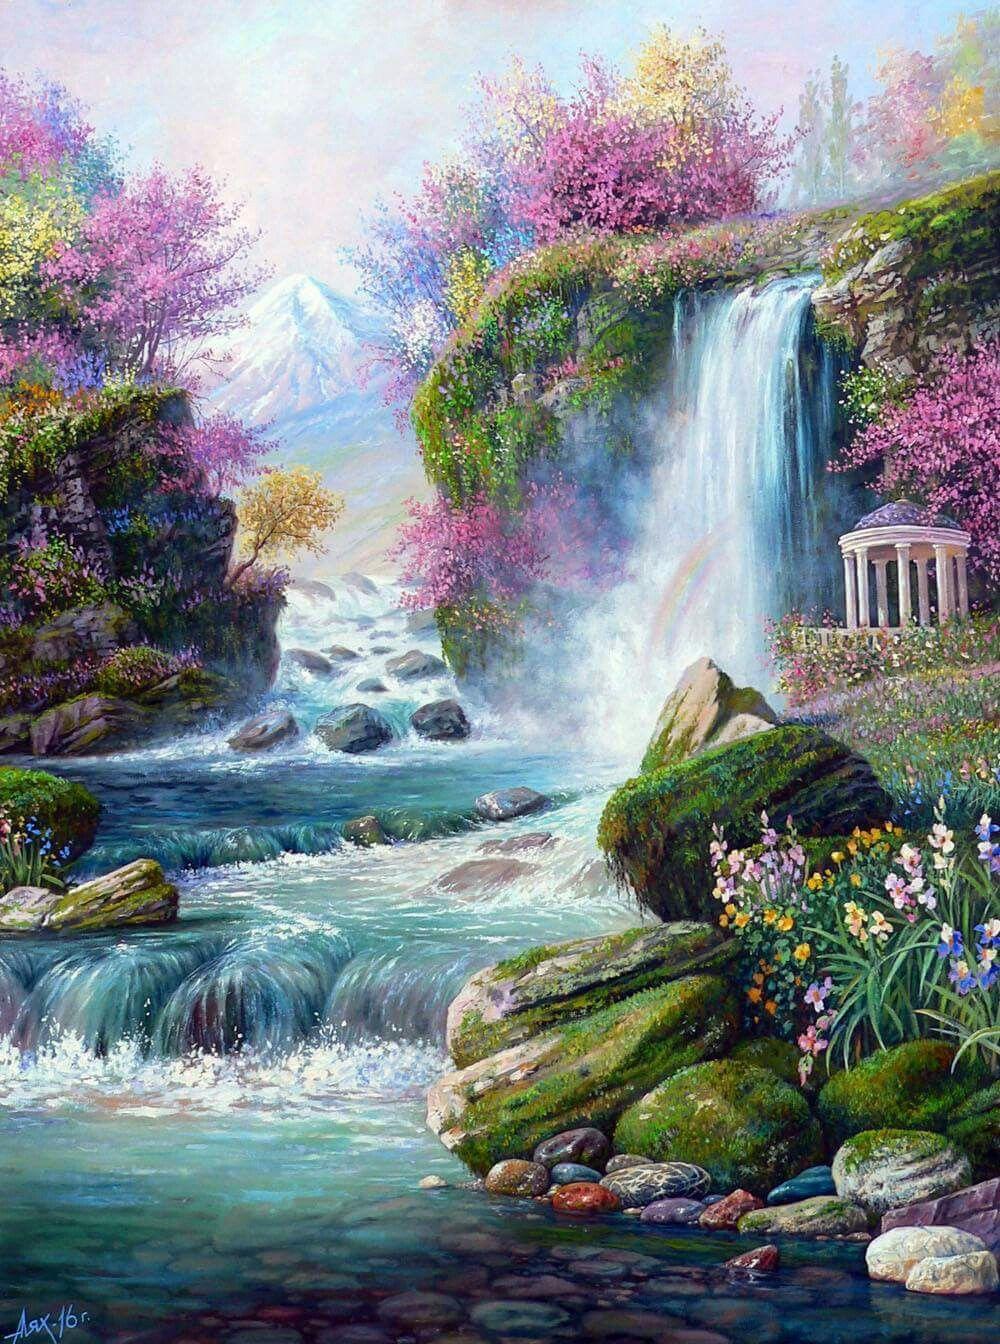 Pin By Ne Oracion On Pintura De Paisajes Nature Paintings Nature Art Prints Scenery Paintings